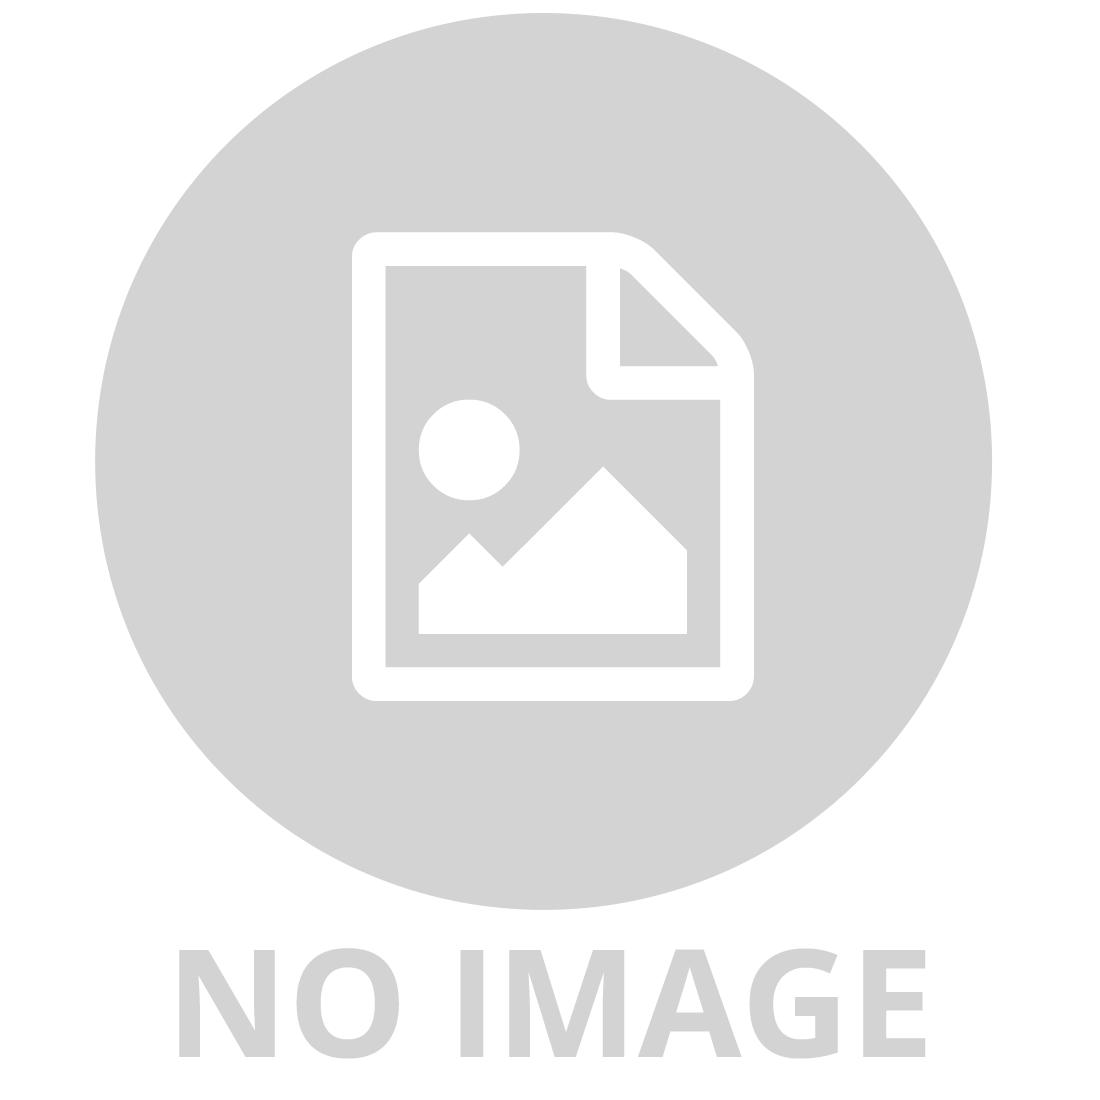 LEGO 76125 MARVEL - IRON MAN HALL OF ARMOR